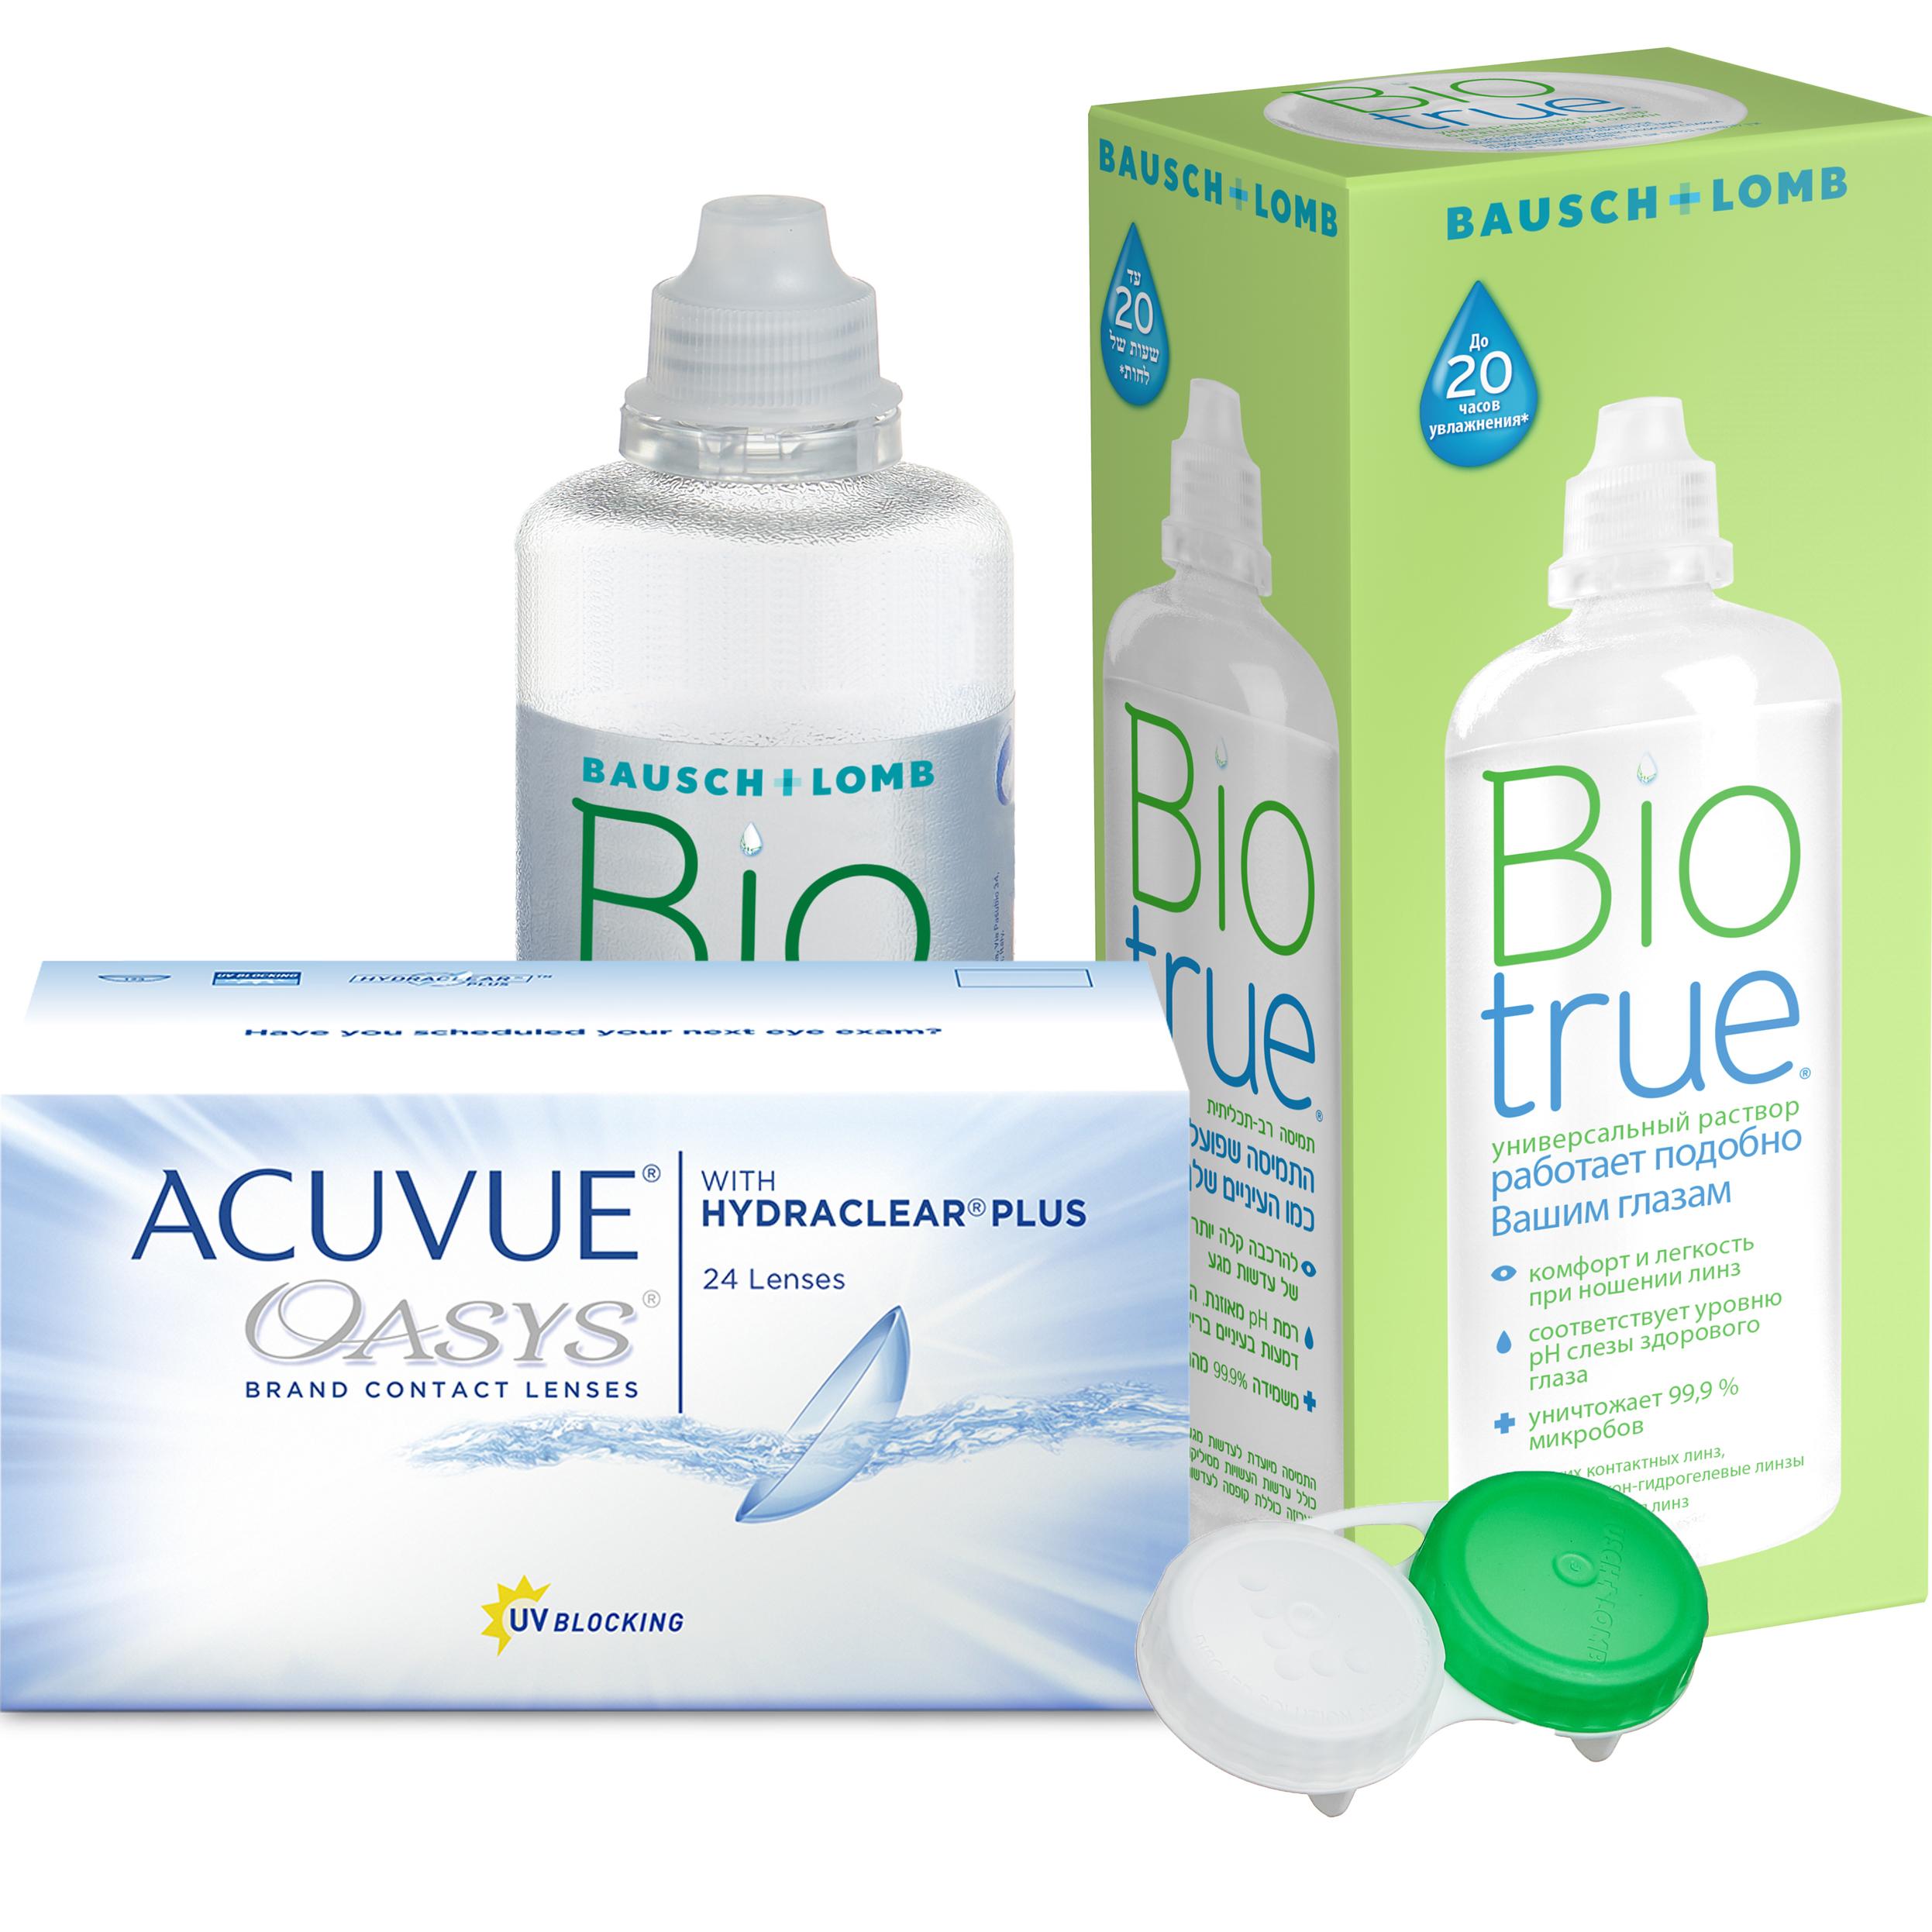 Купить Oasys with Hydraclear Plus 24 линзы + Biotrue, Контактные линзы Acuvue Oasys with Hydraclear Plus 24 линзы R 8.4 -9, 00 + Biotrue 300 мл